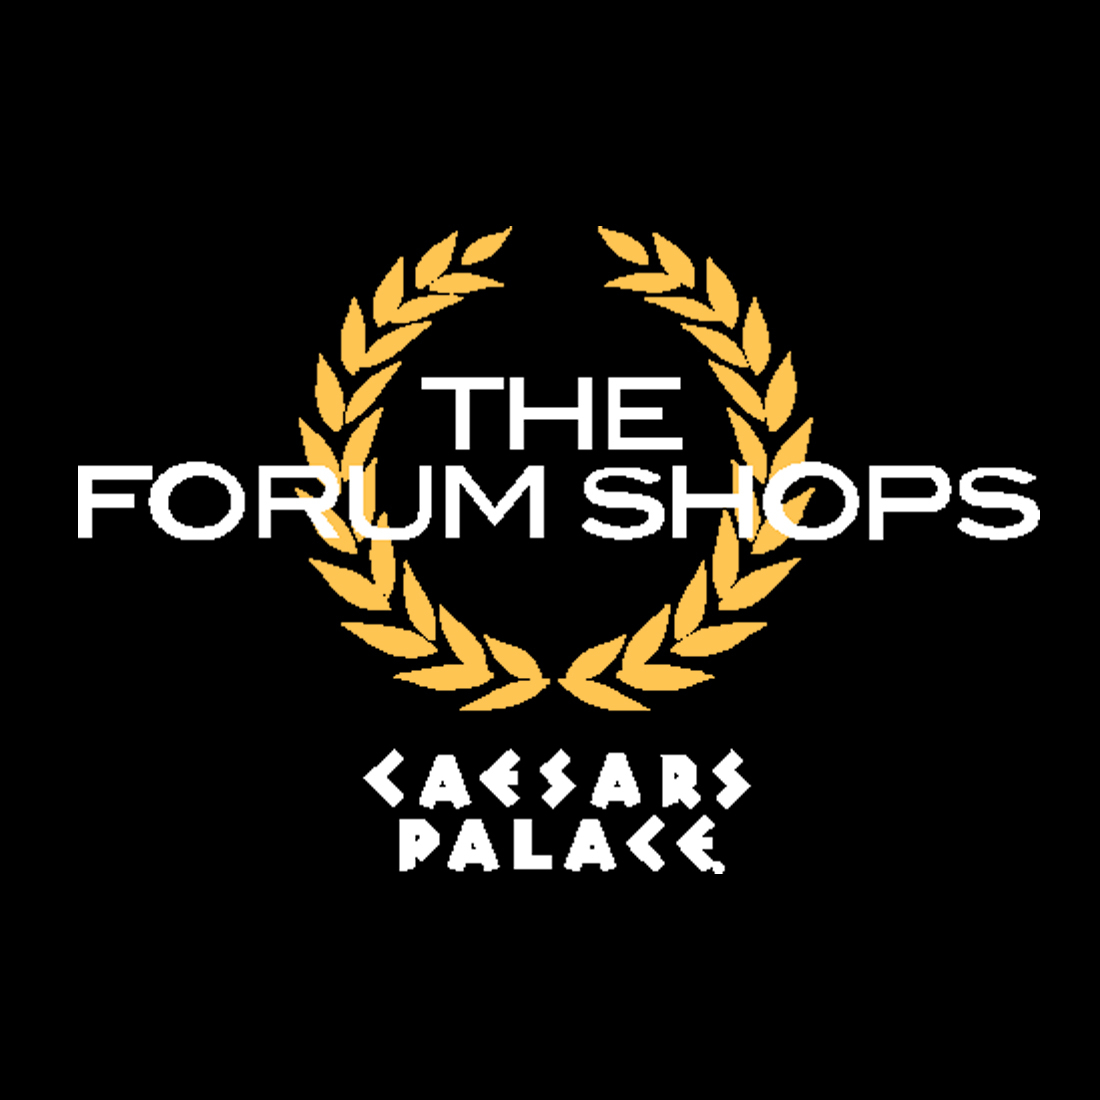 The Forum Shops at Caesars